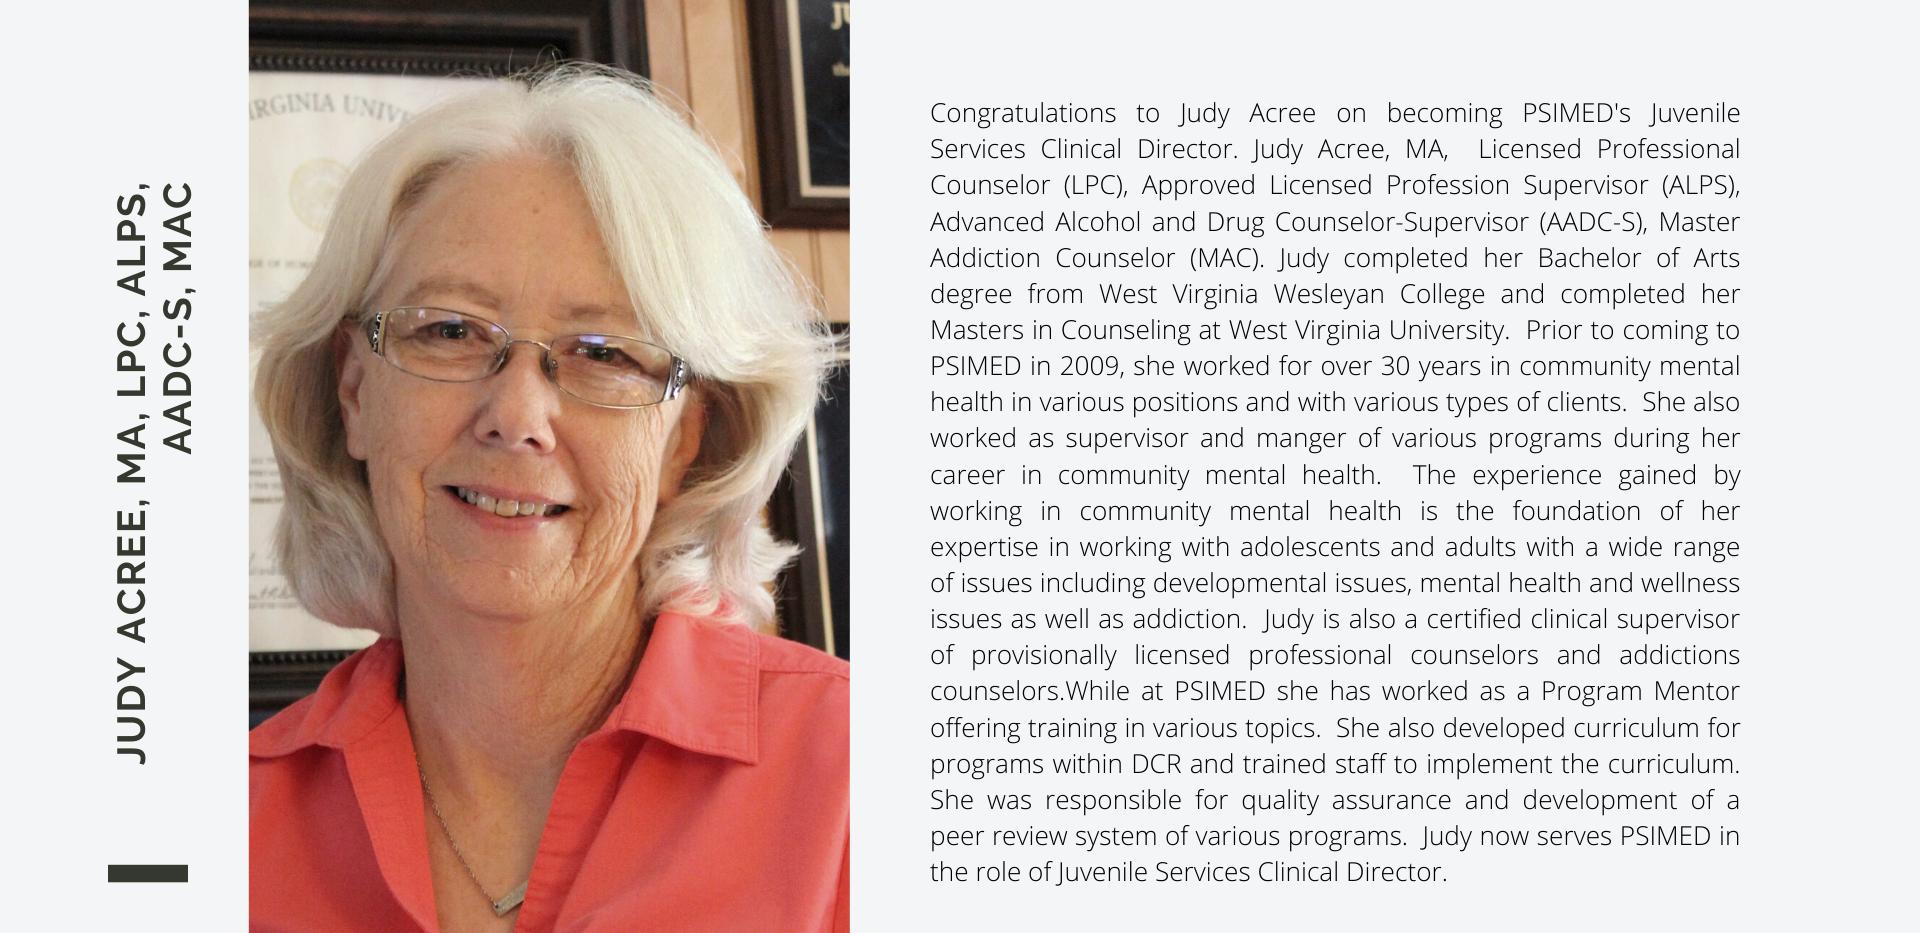 Judy Acree, MA, LPC, AlPS, AADC-S, MAC (